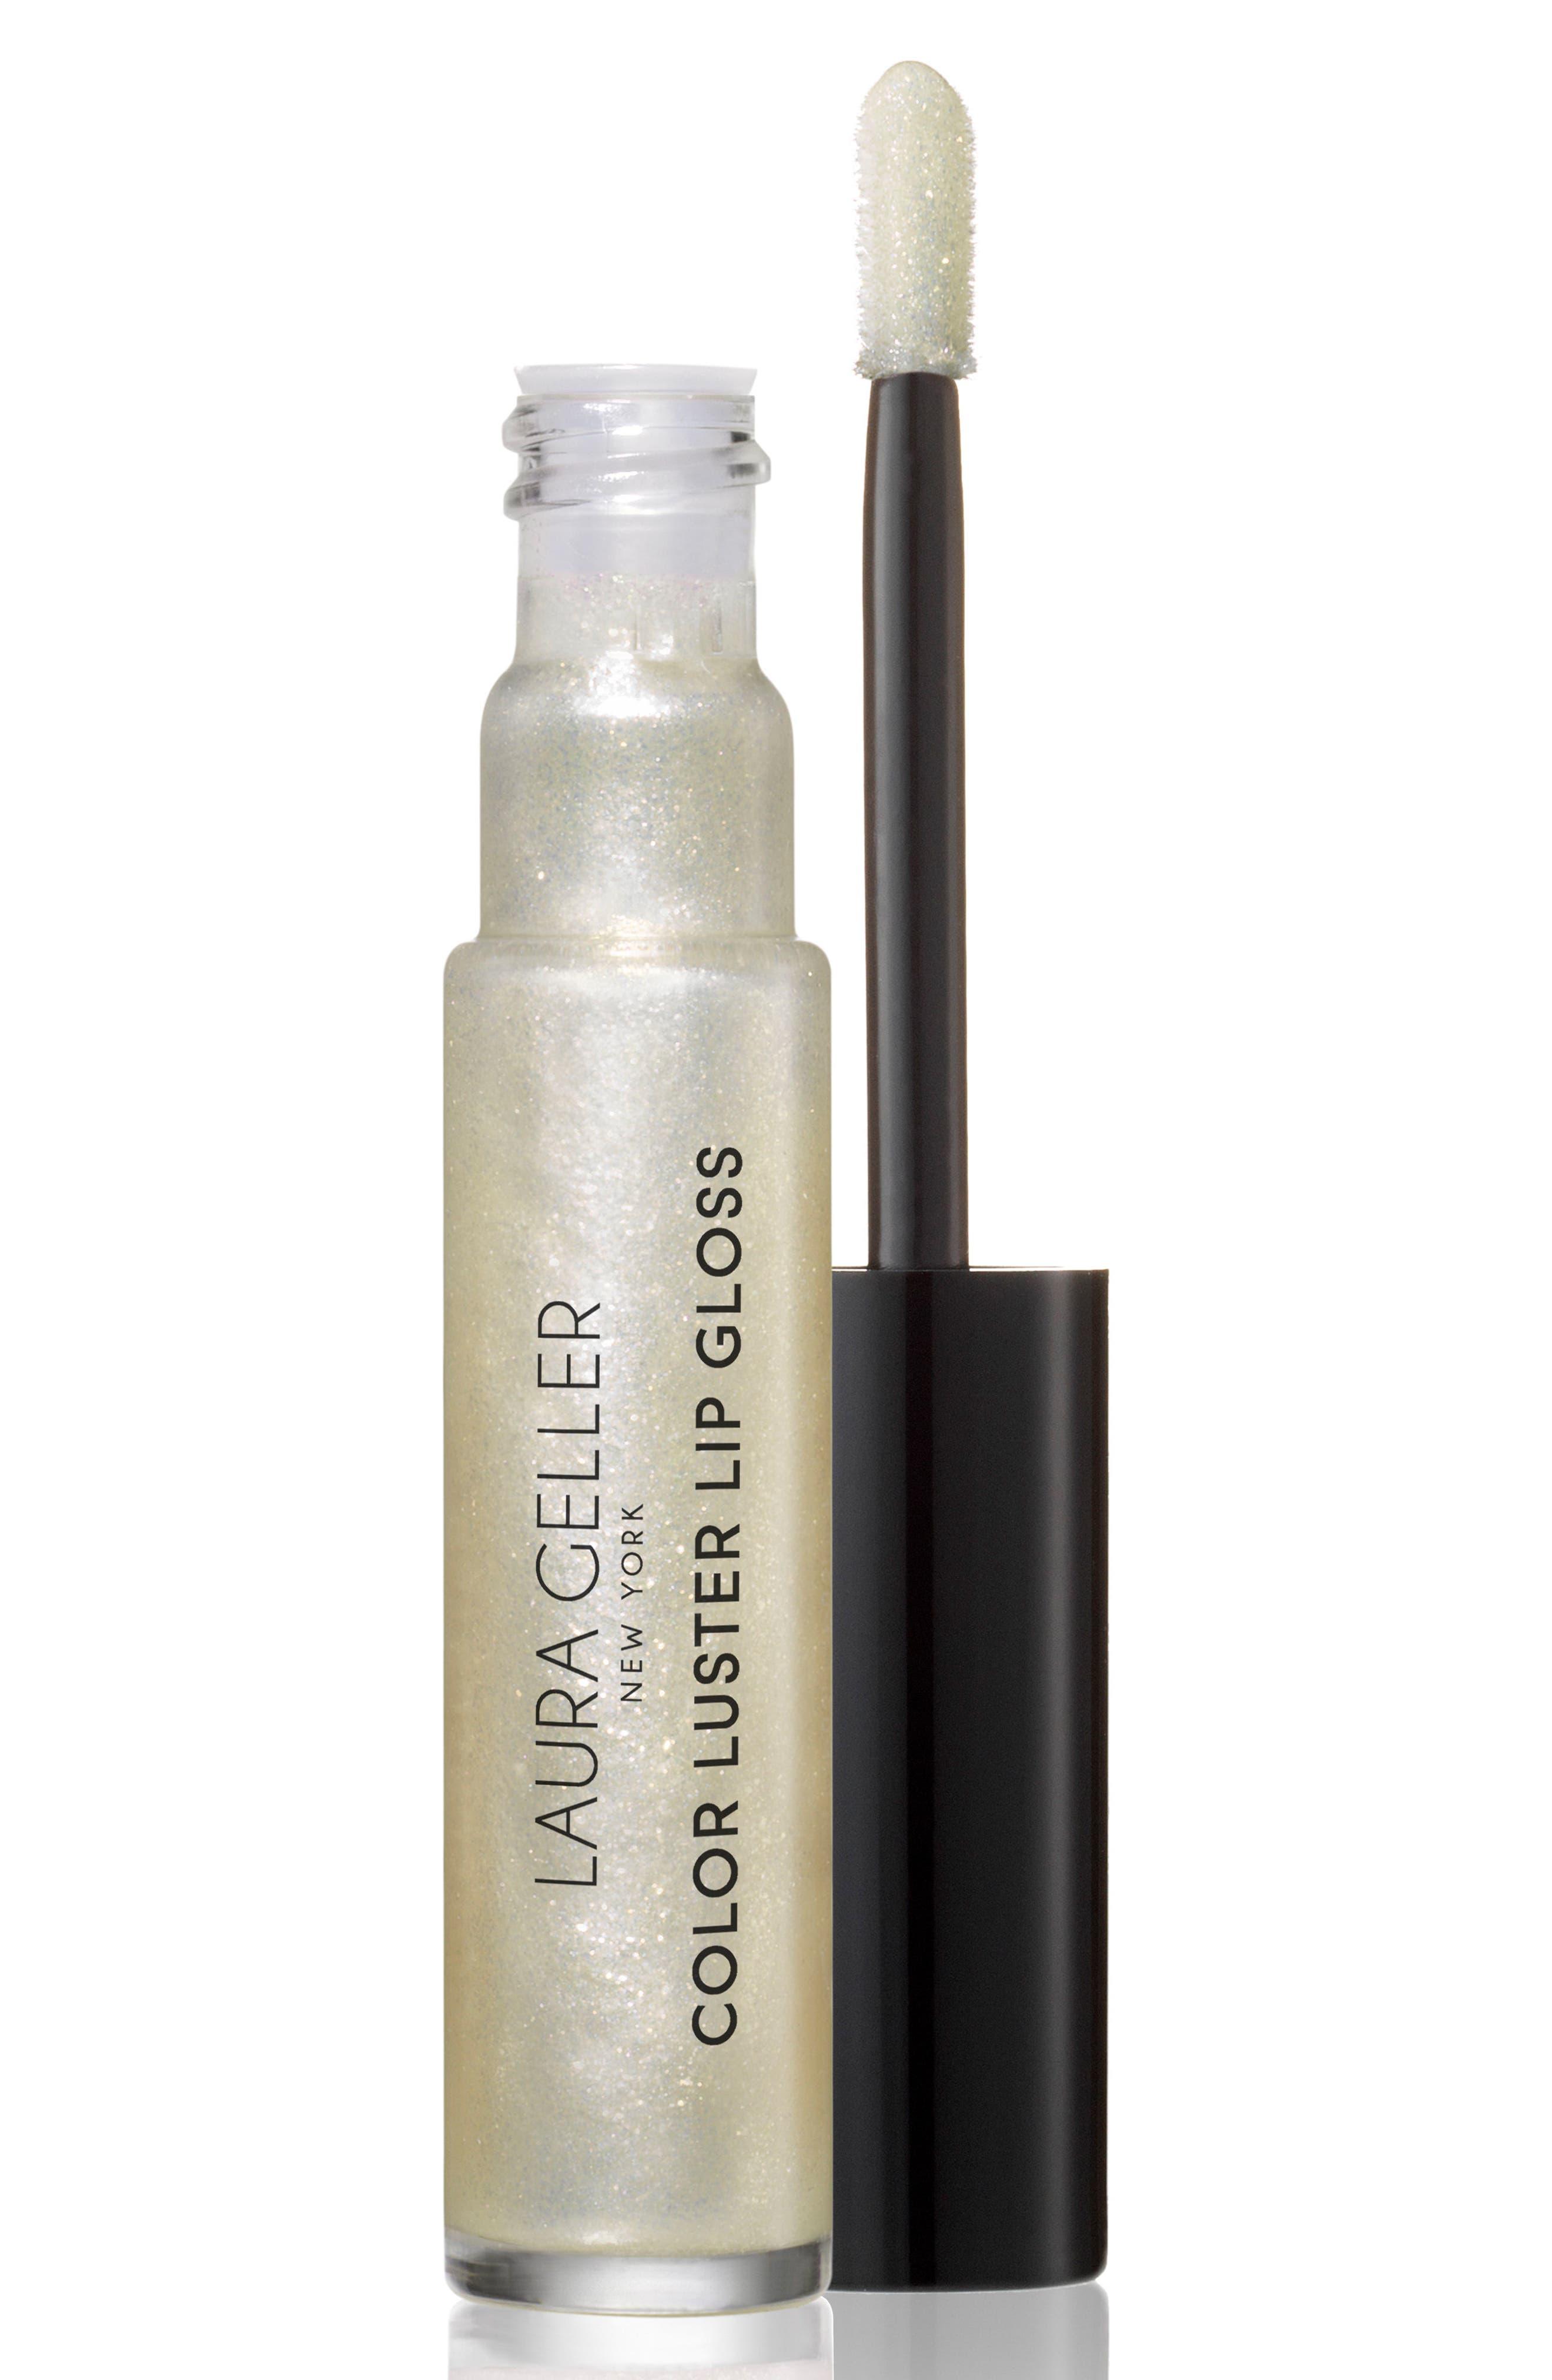 Laura Geller Beauty Color Luster Lip Gloss Hi-Def Top Coat